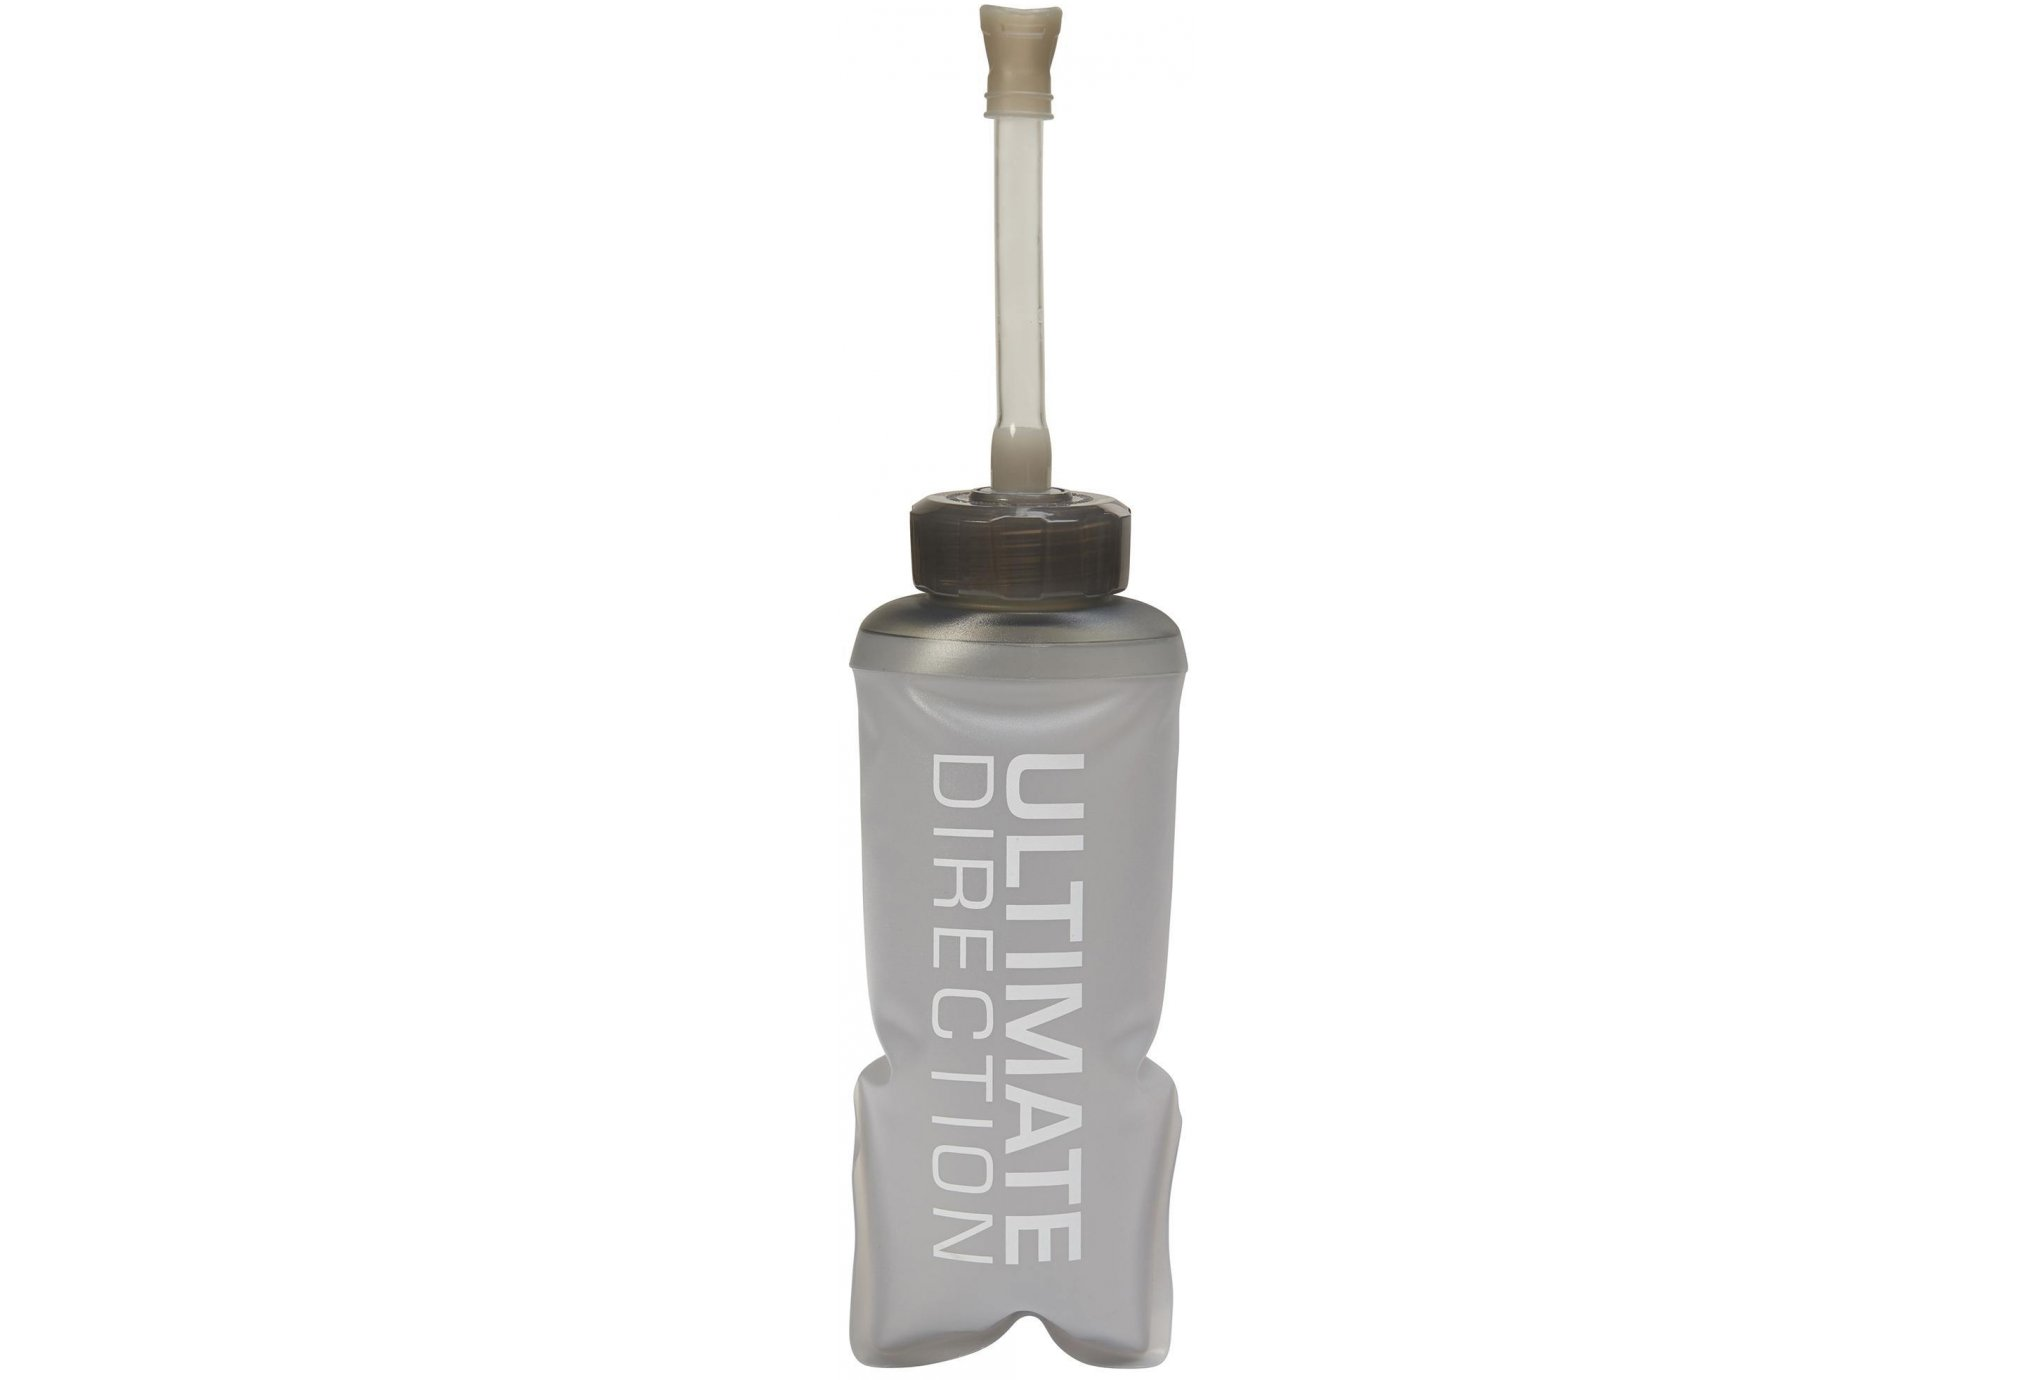 Ultimate Direction Body Bottle V2 500S Sac hydratation / Gourde